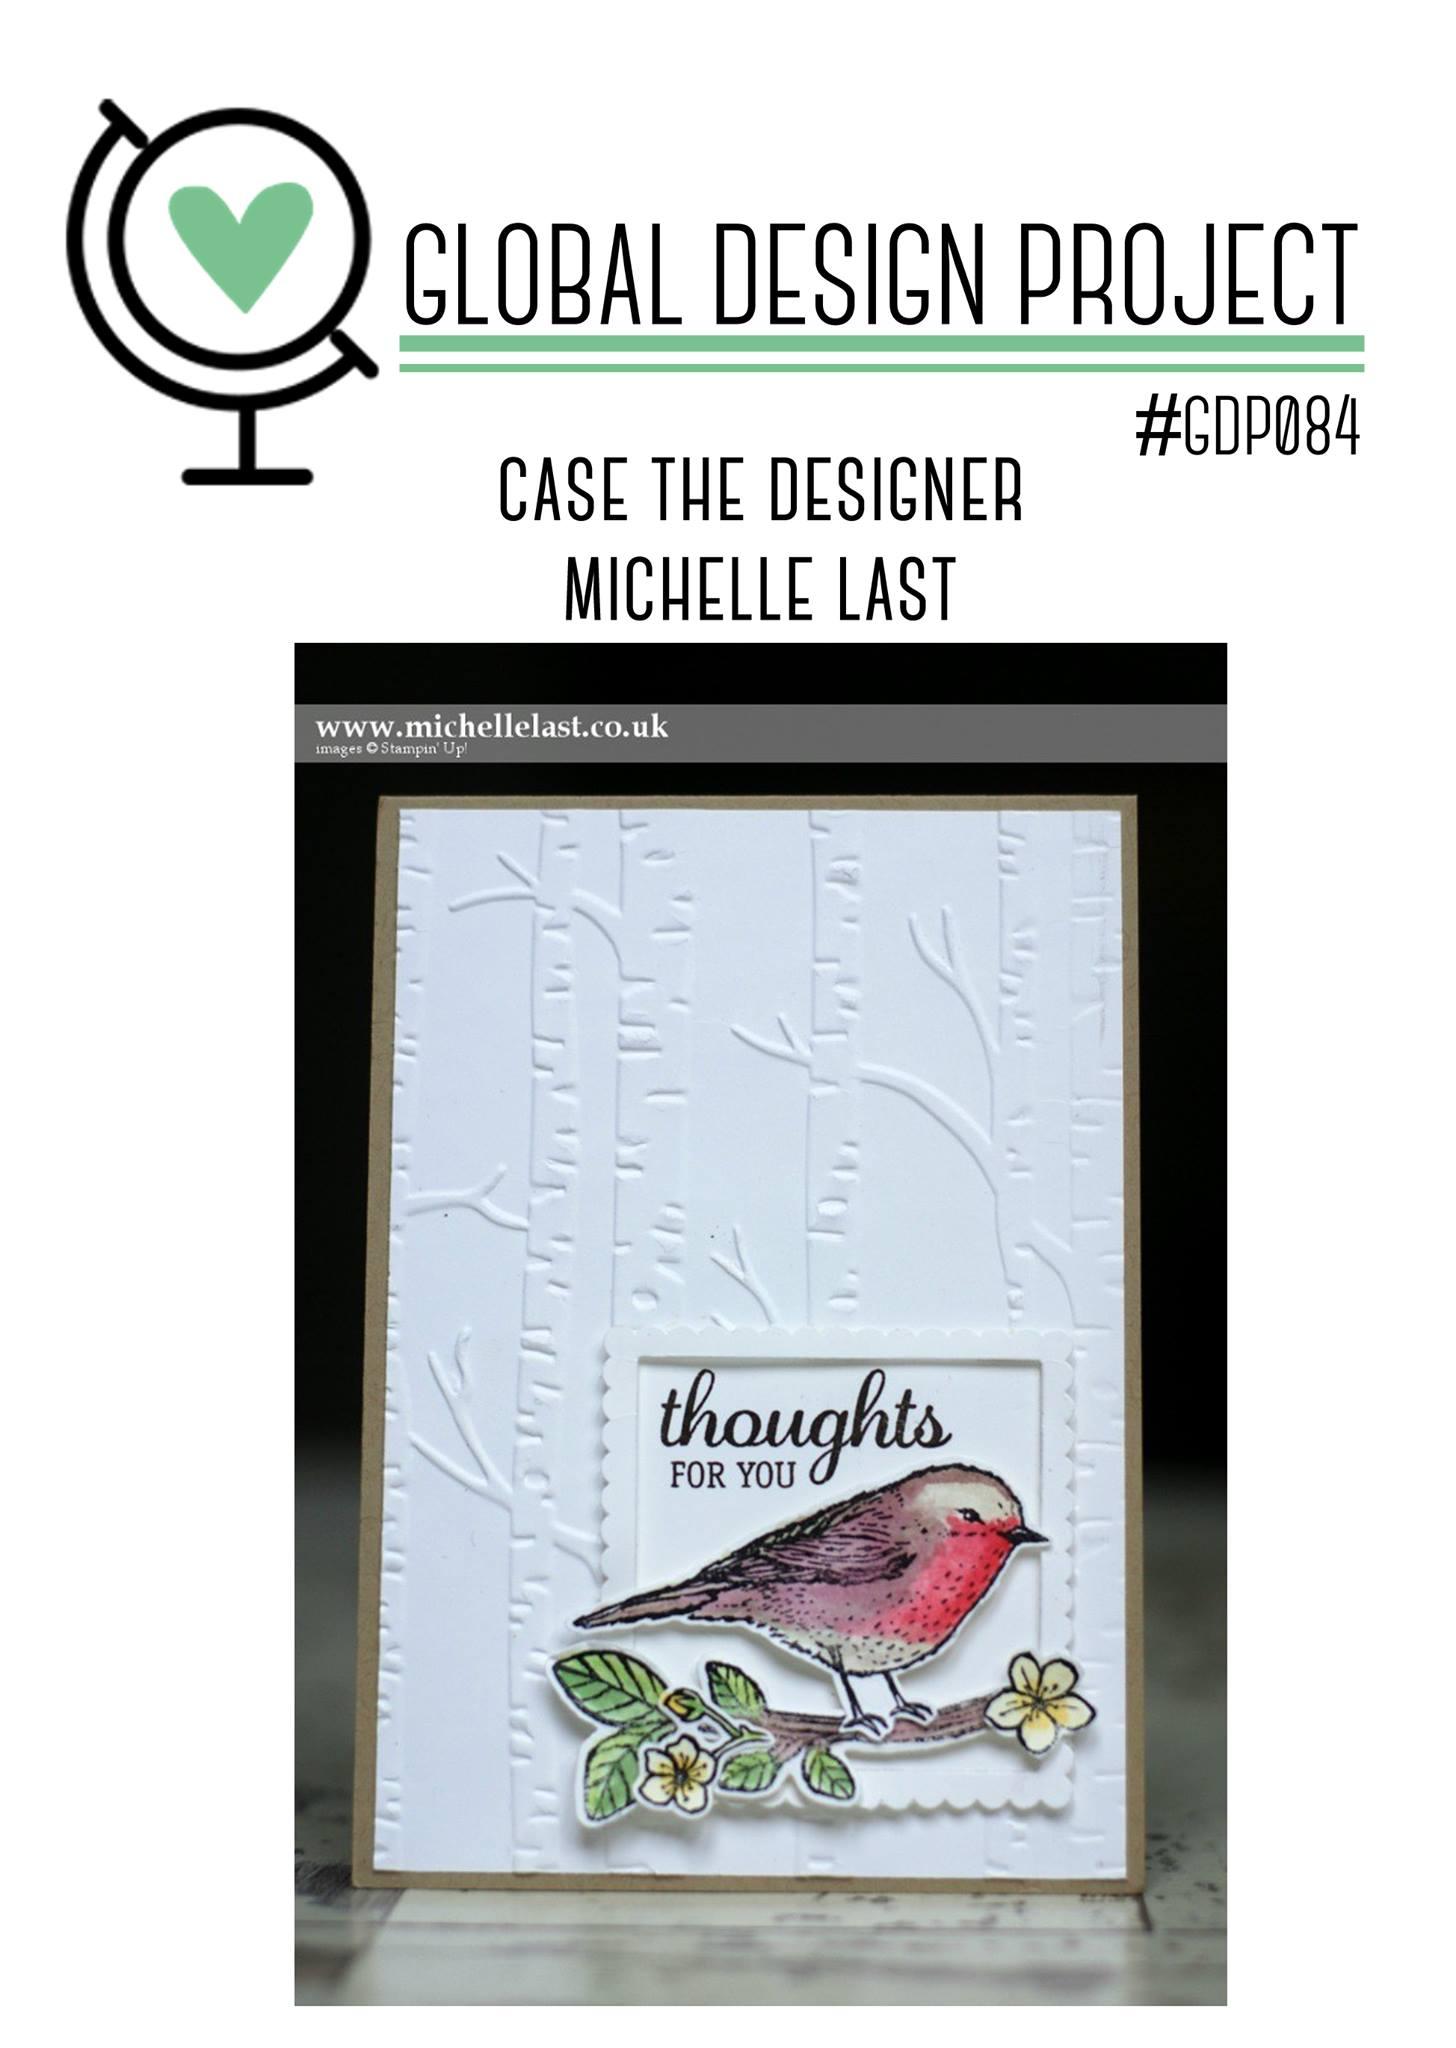 #GDP084 case the designer Michelle Last